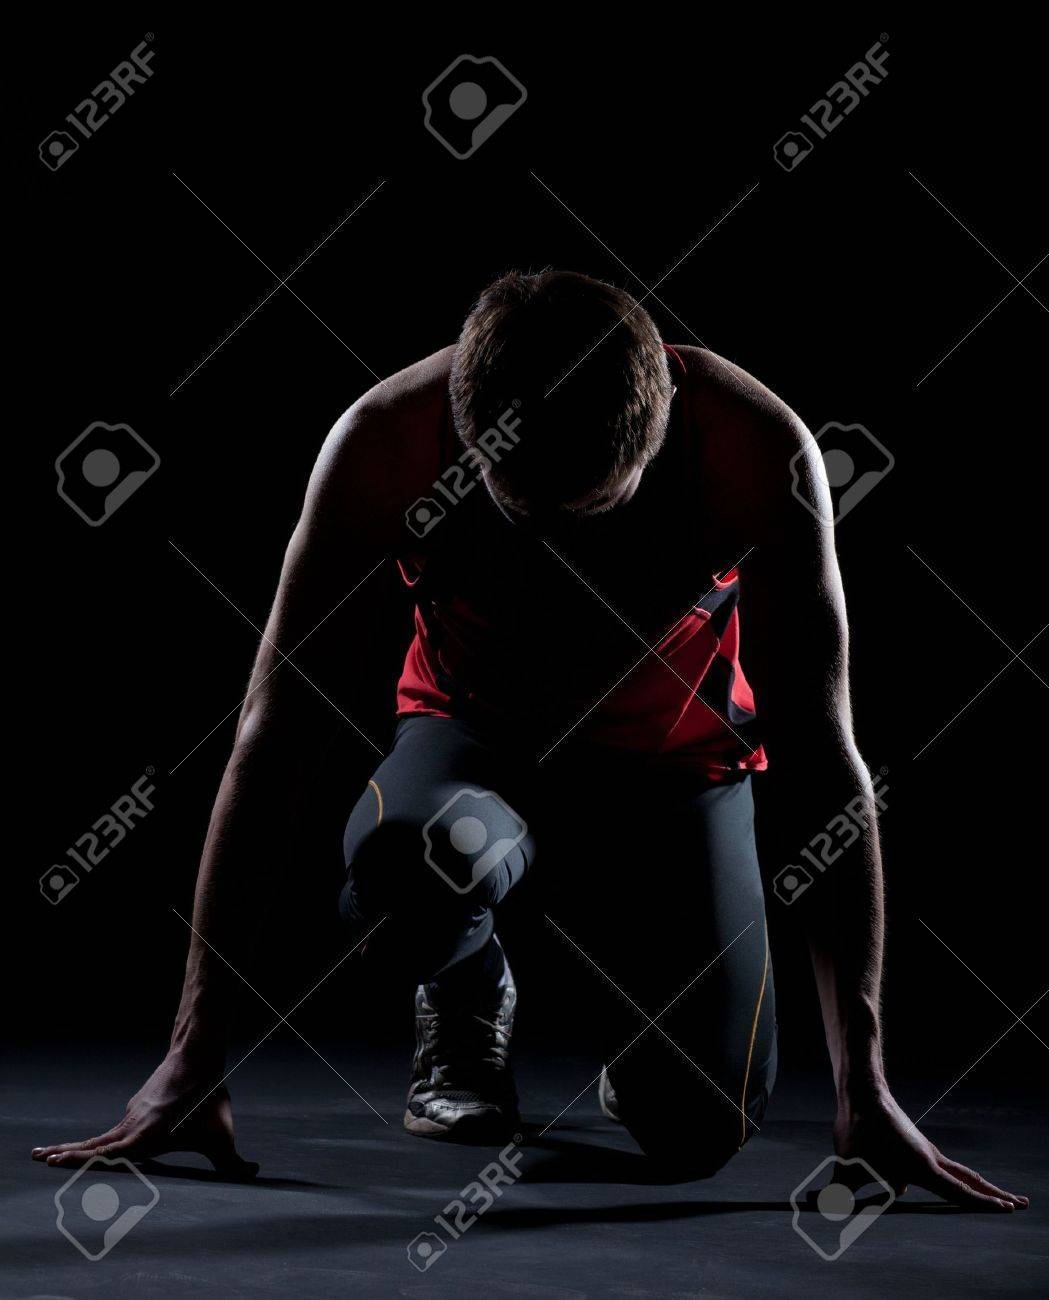 Athlete ready to start on black background Stock Photo - 9028611